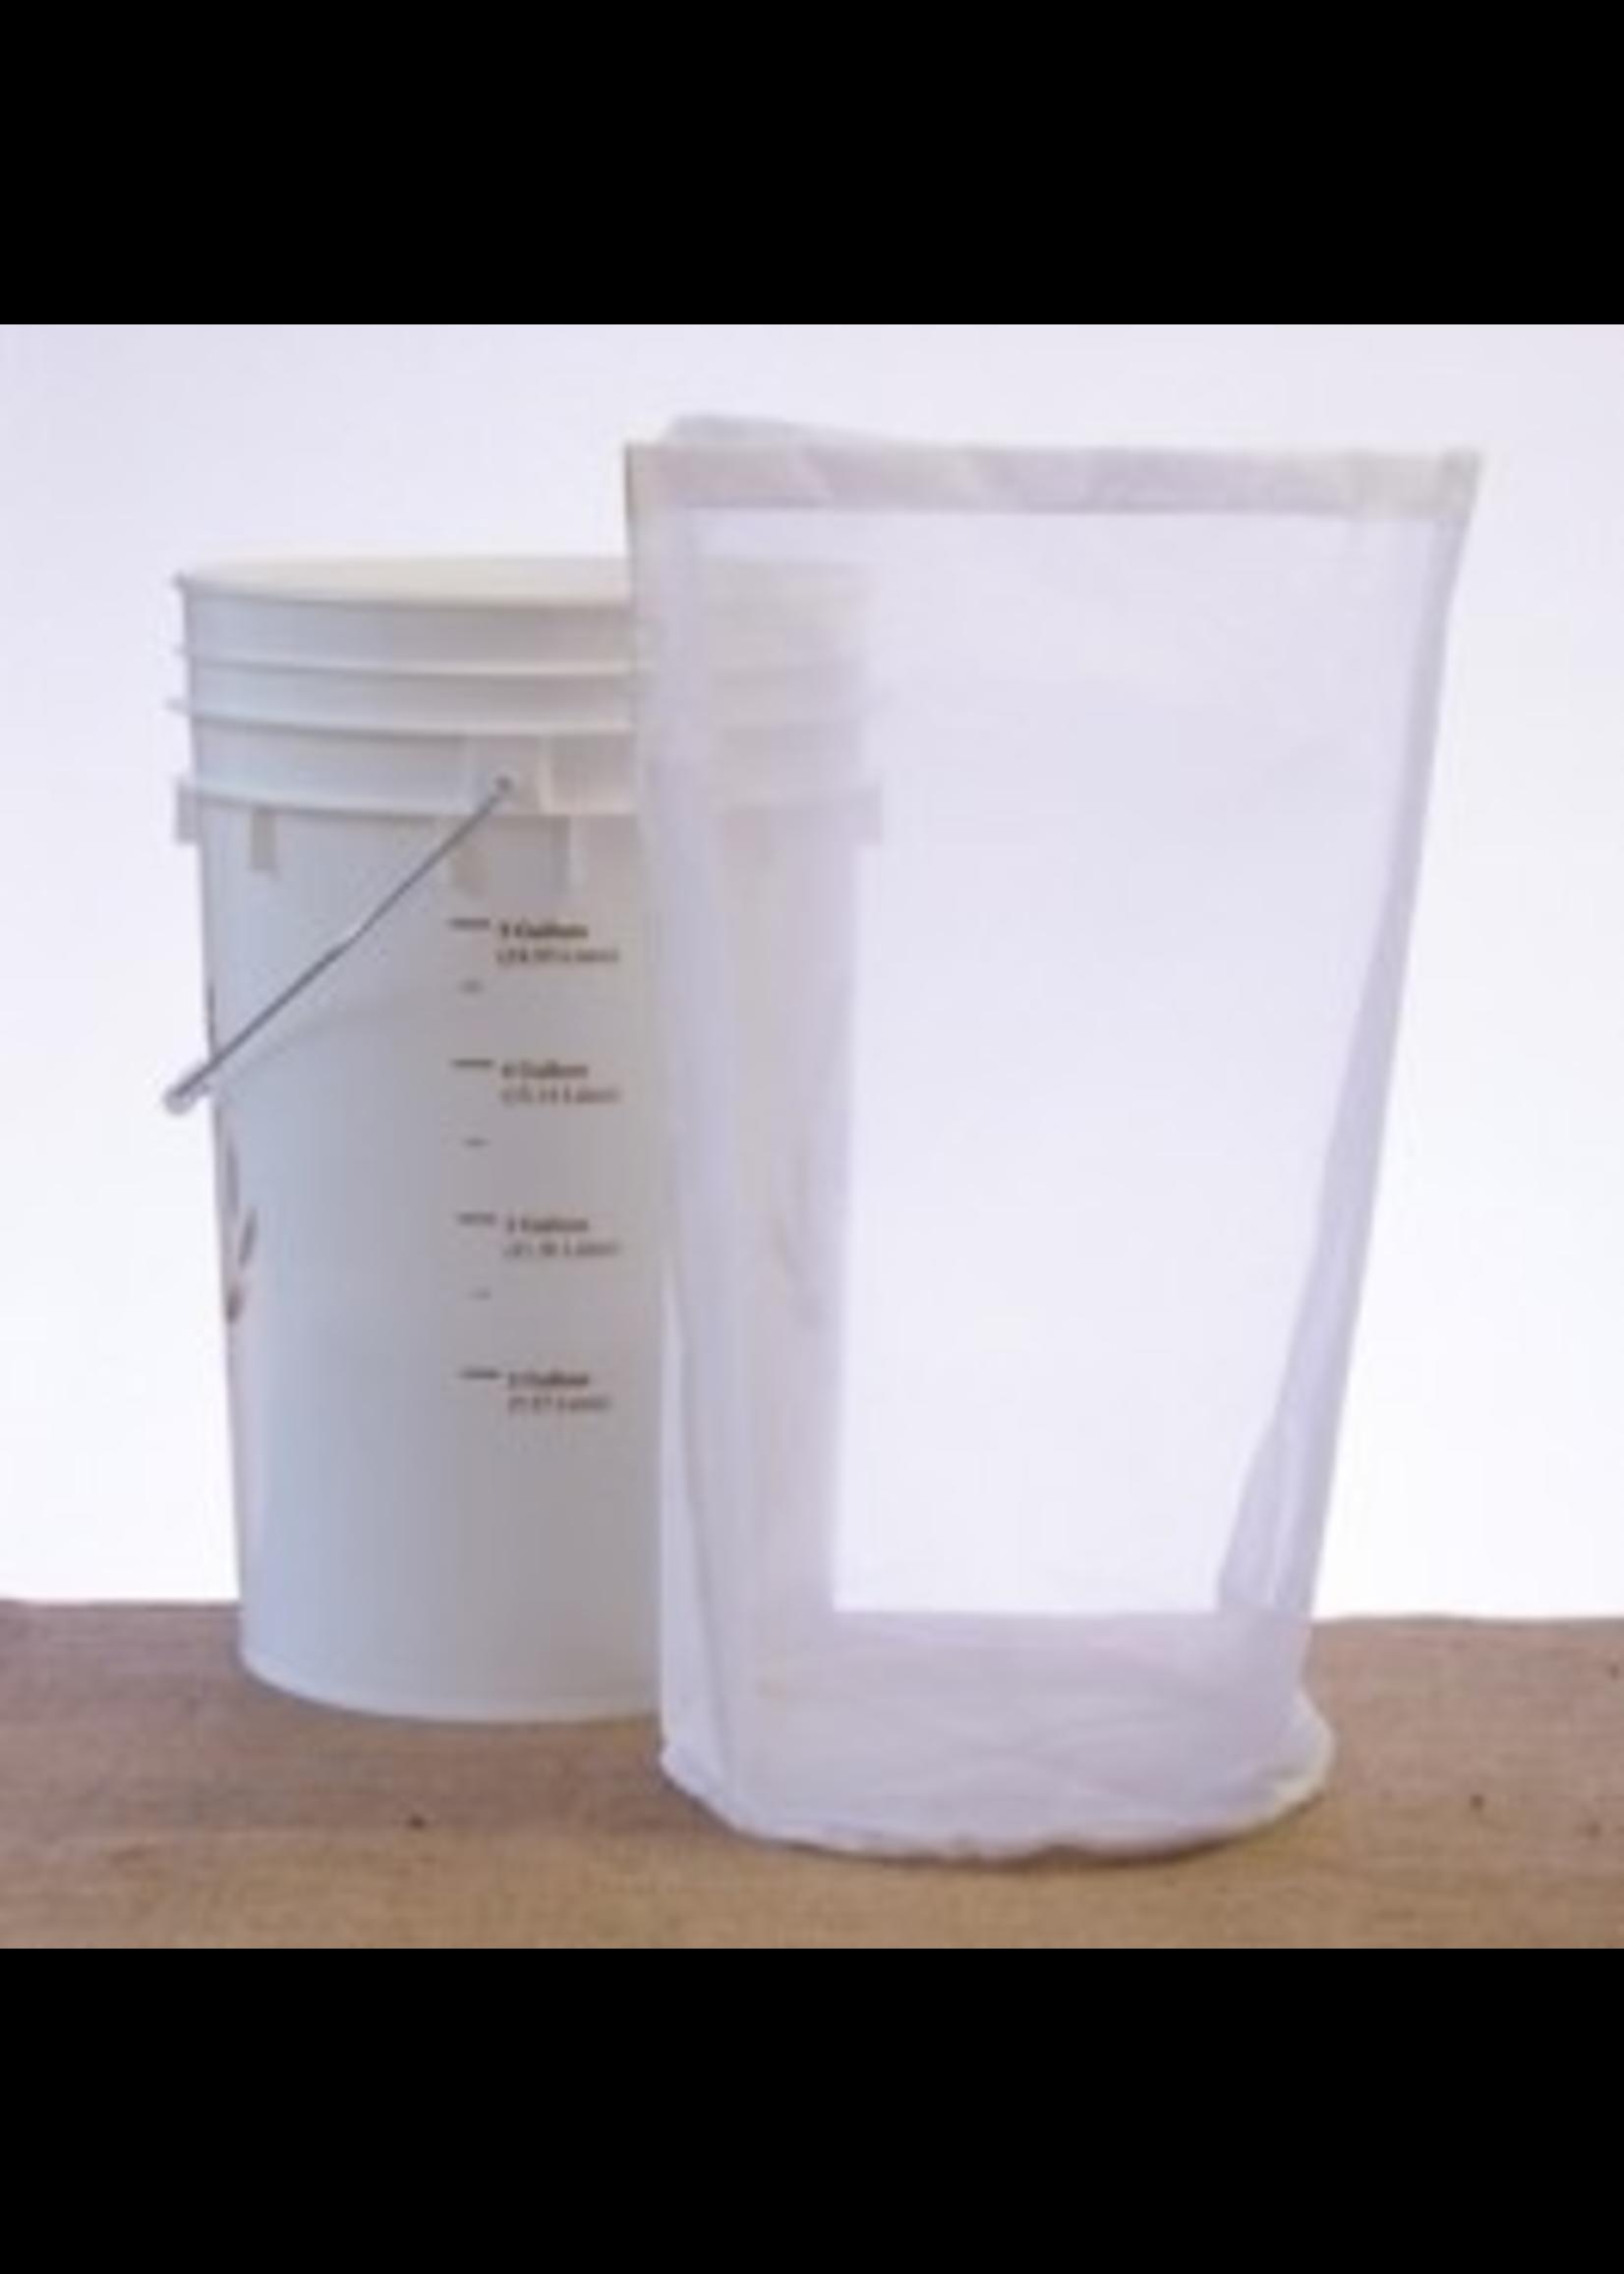 Brewing Straining Bag, Nylon - 6.5 Gallon Bucket Sparging Bag